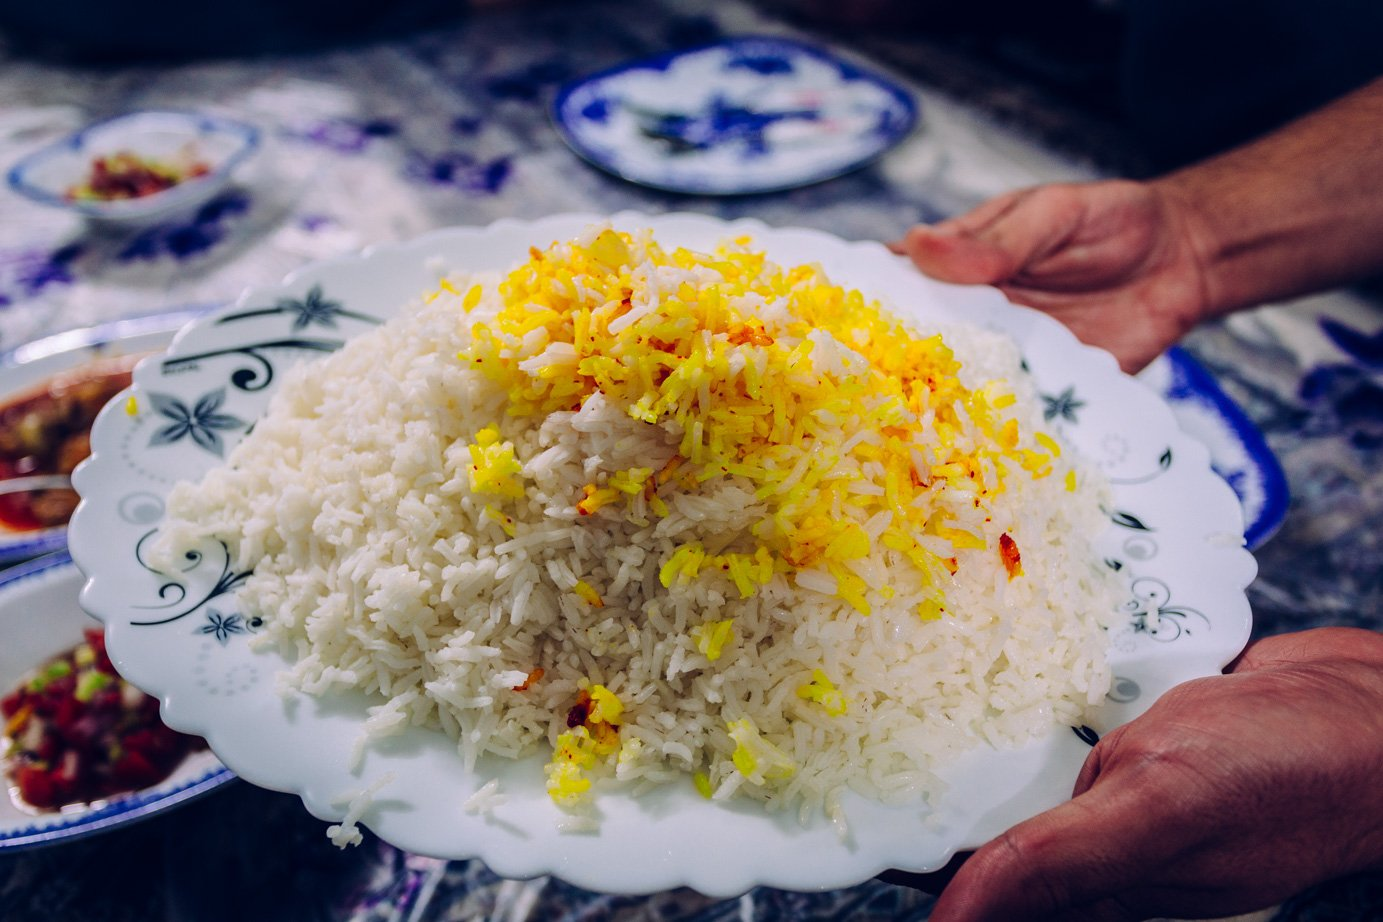 Iran natalerzu